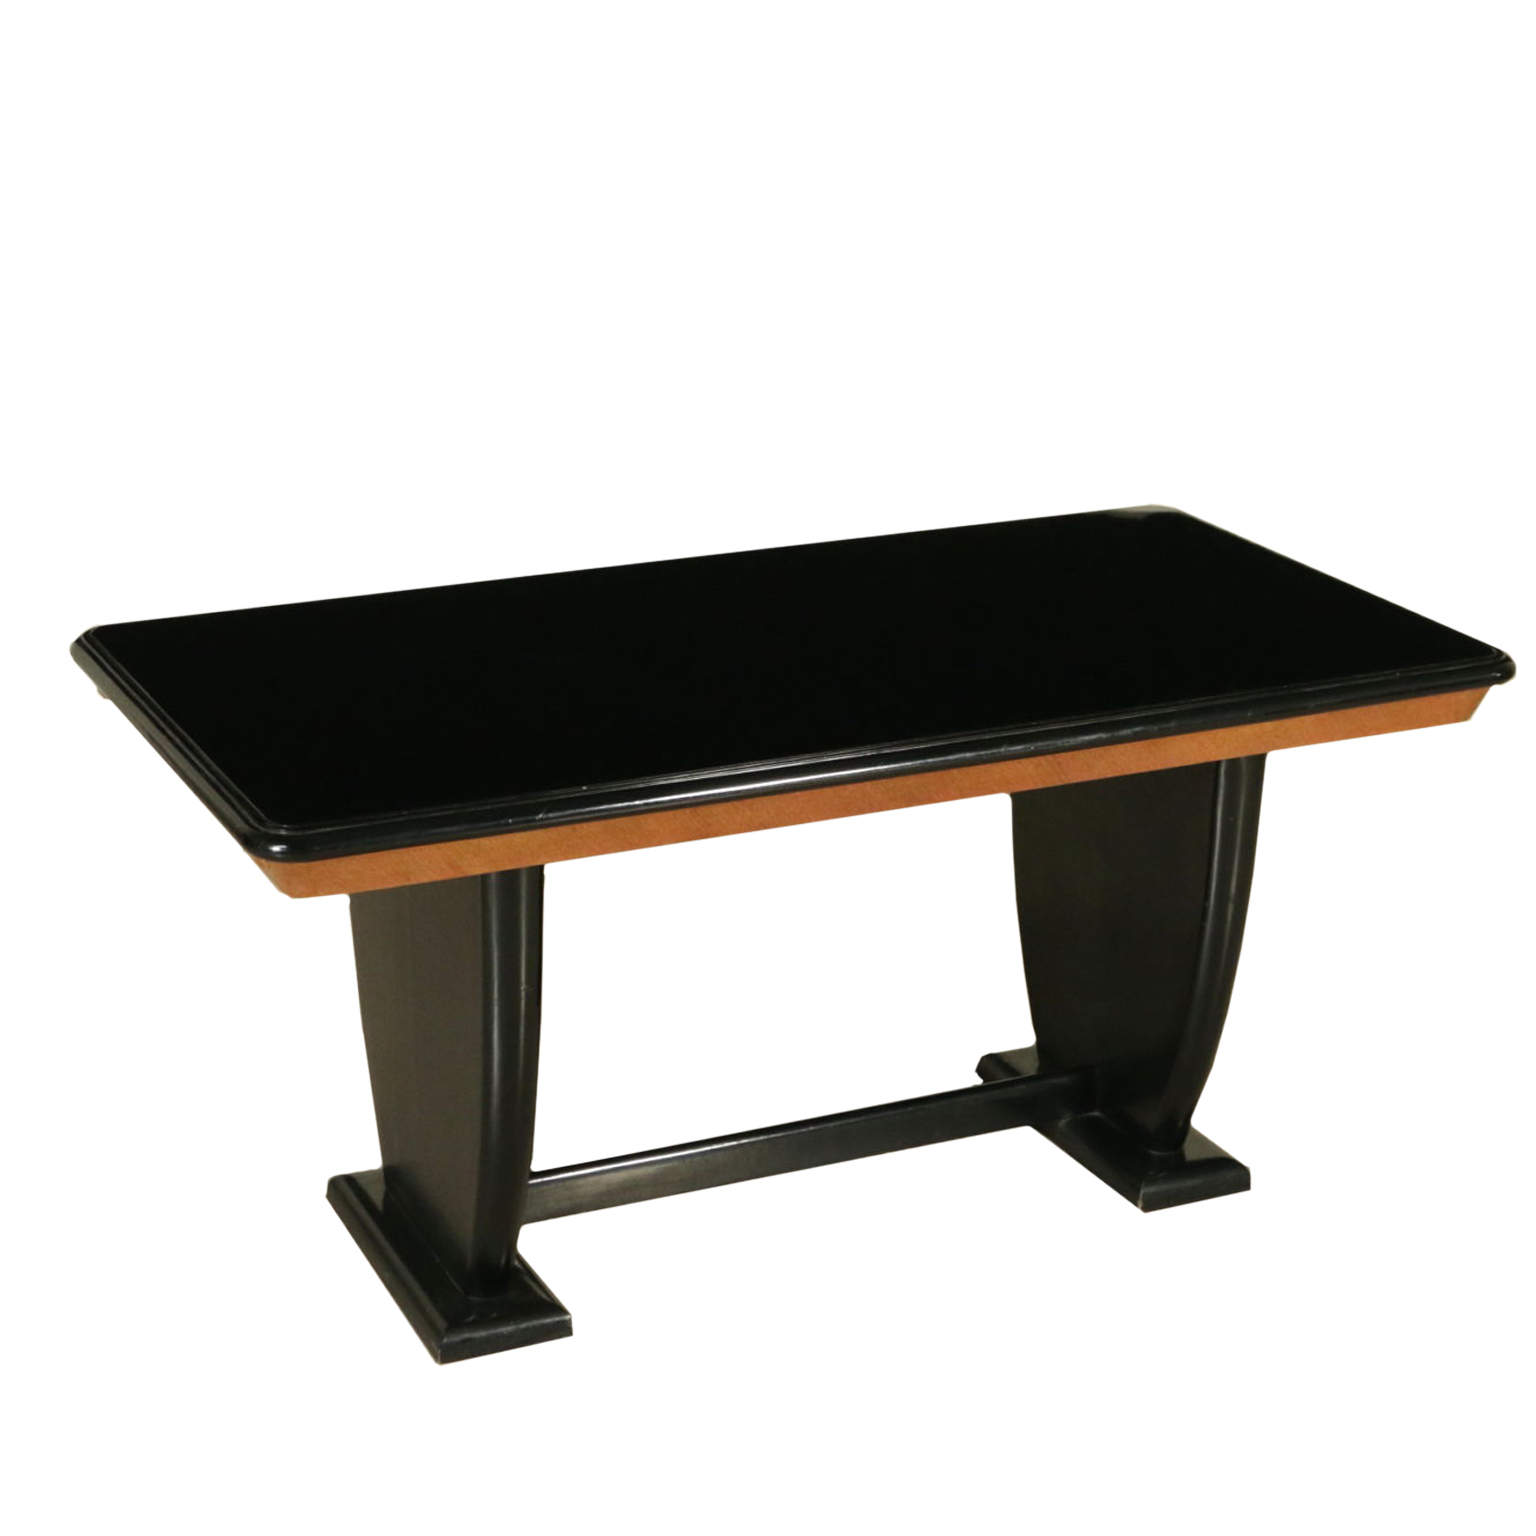 Tavolo anni 40 tavoli modernariato for Negozi tavoli milano